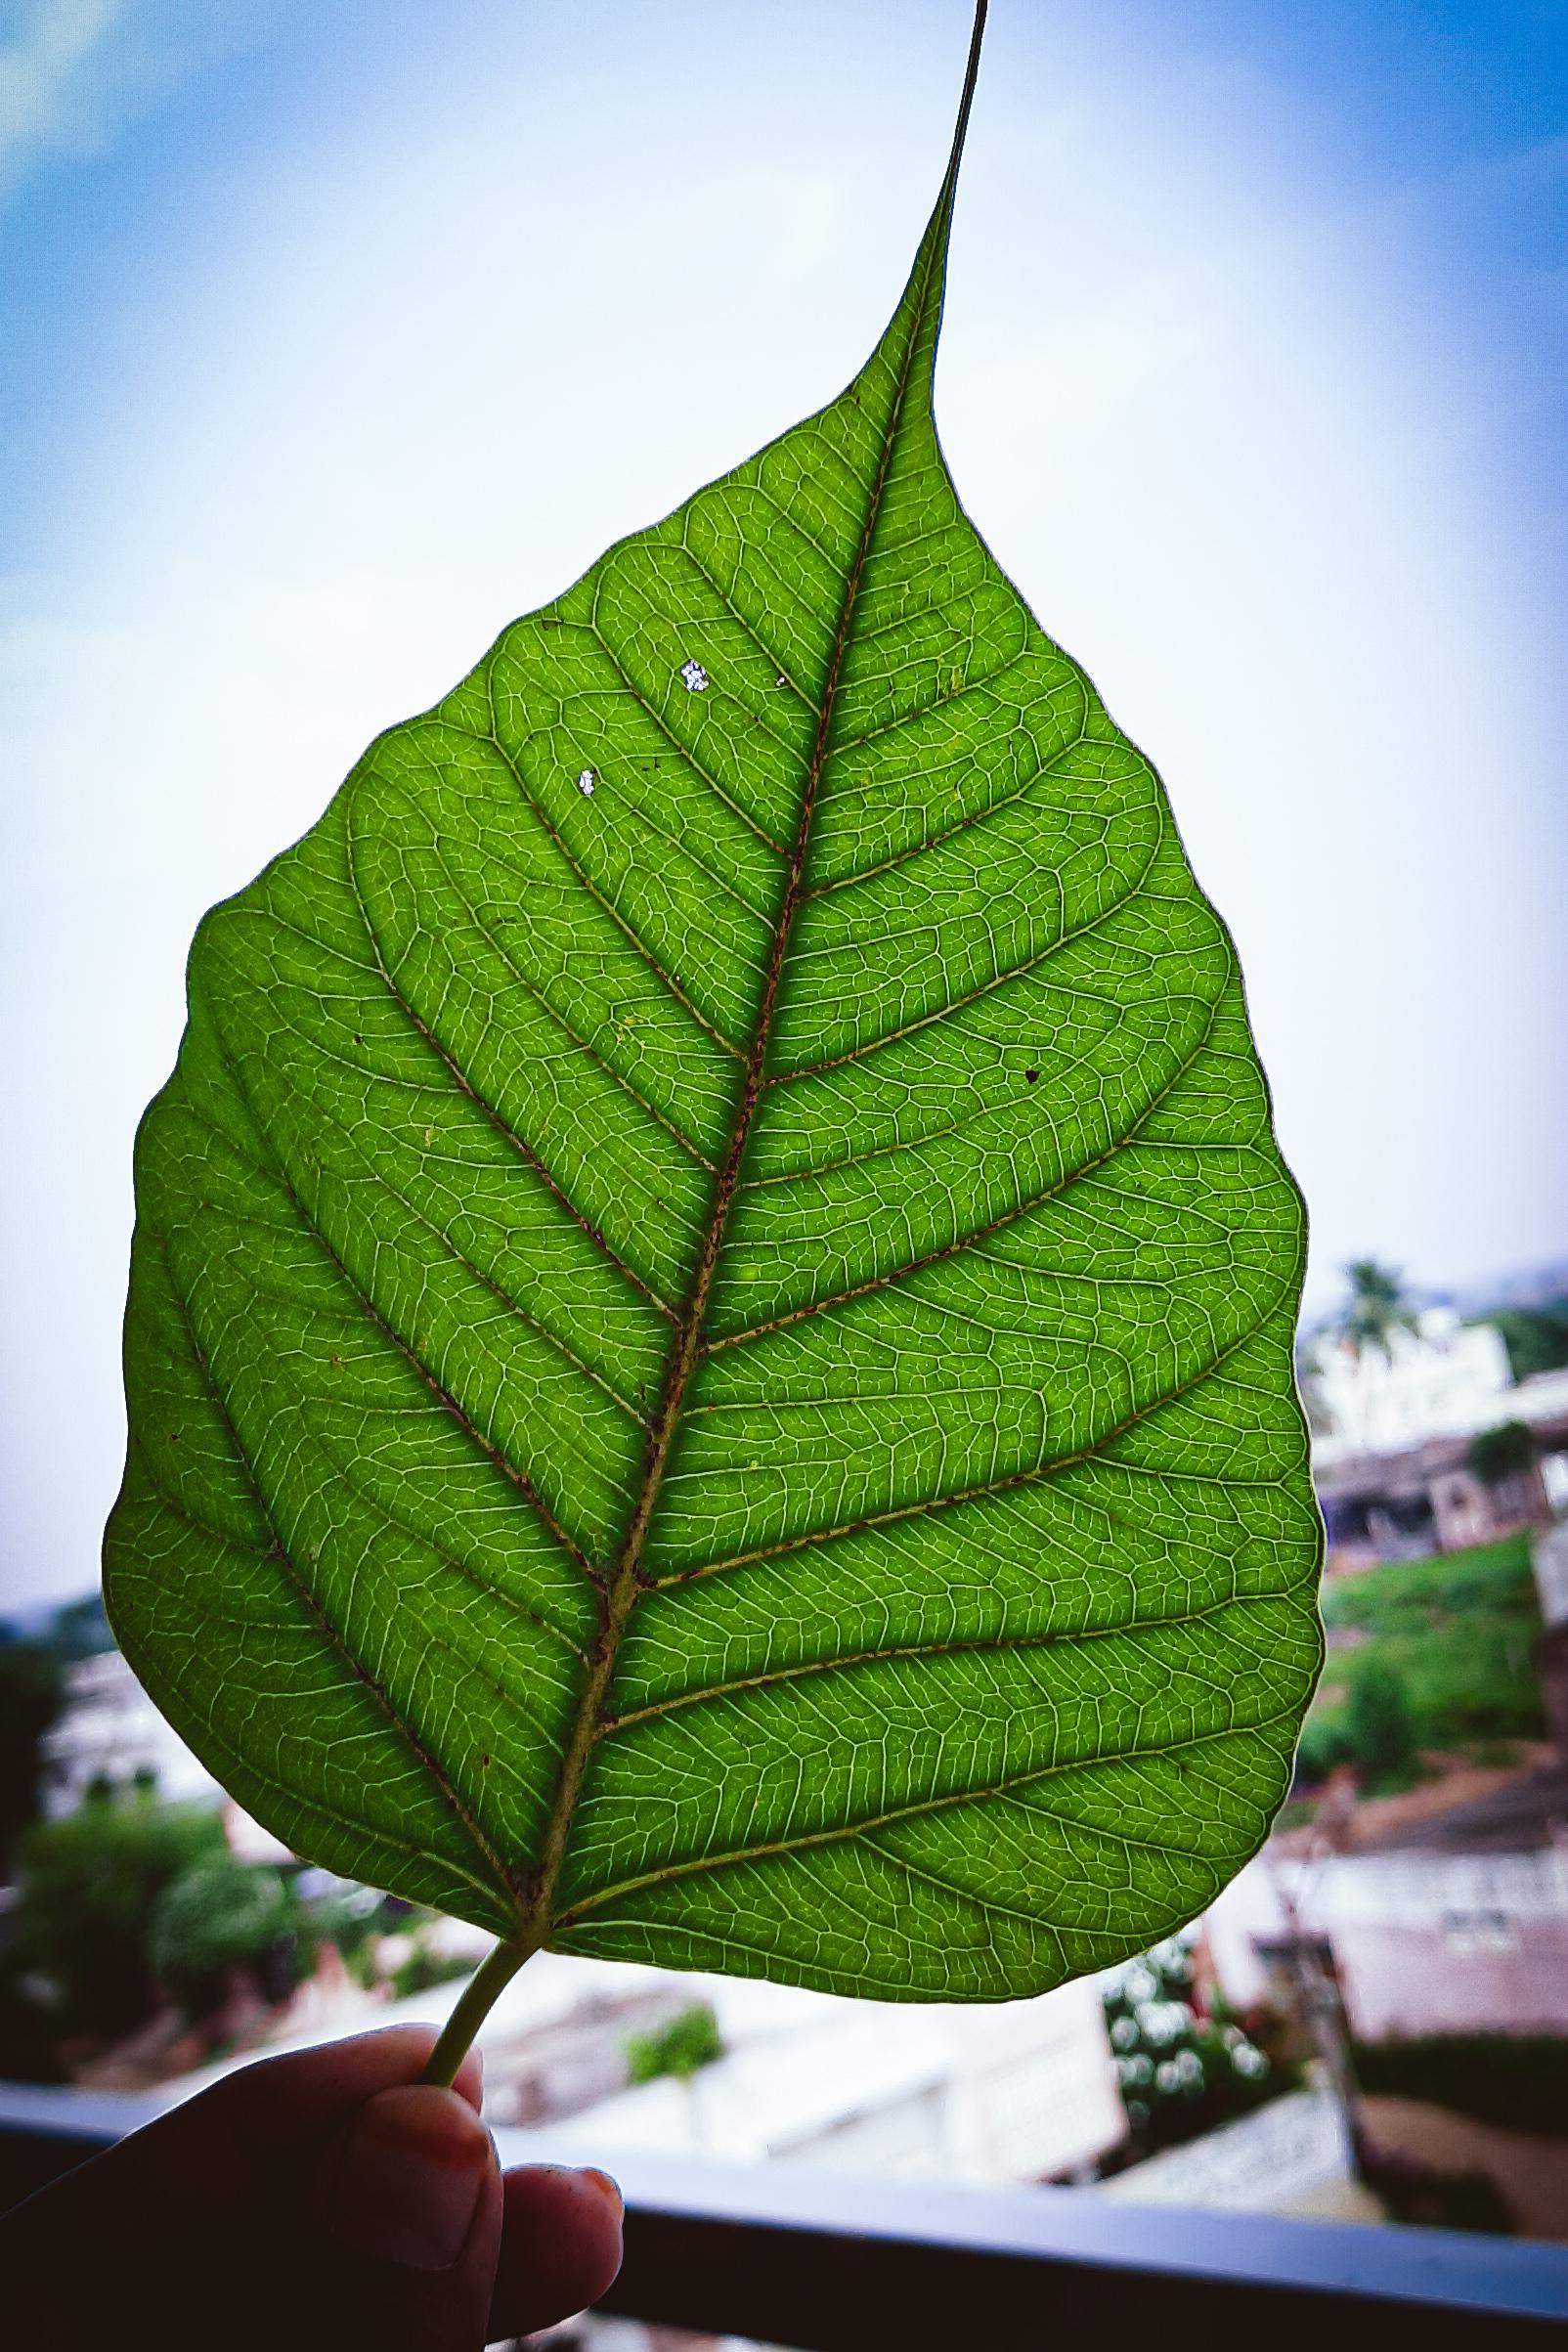 A leaf of Ficus religiosa